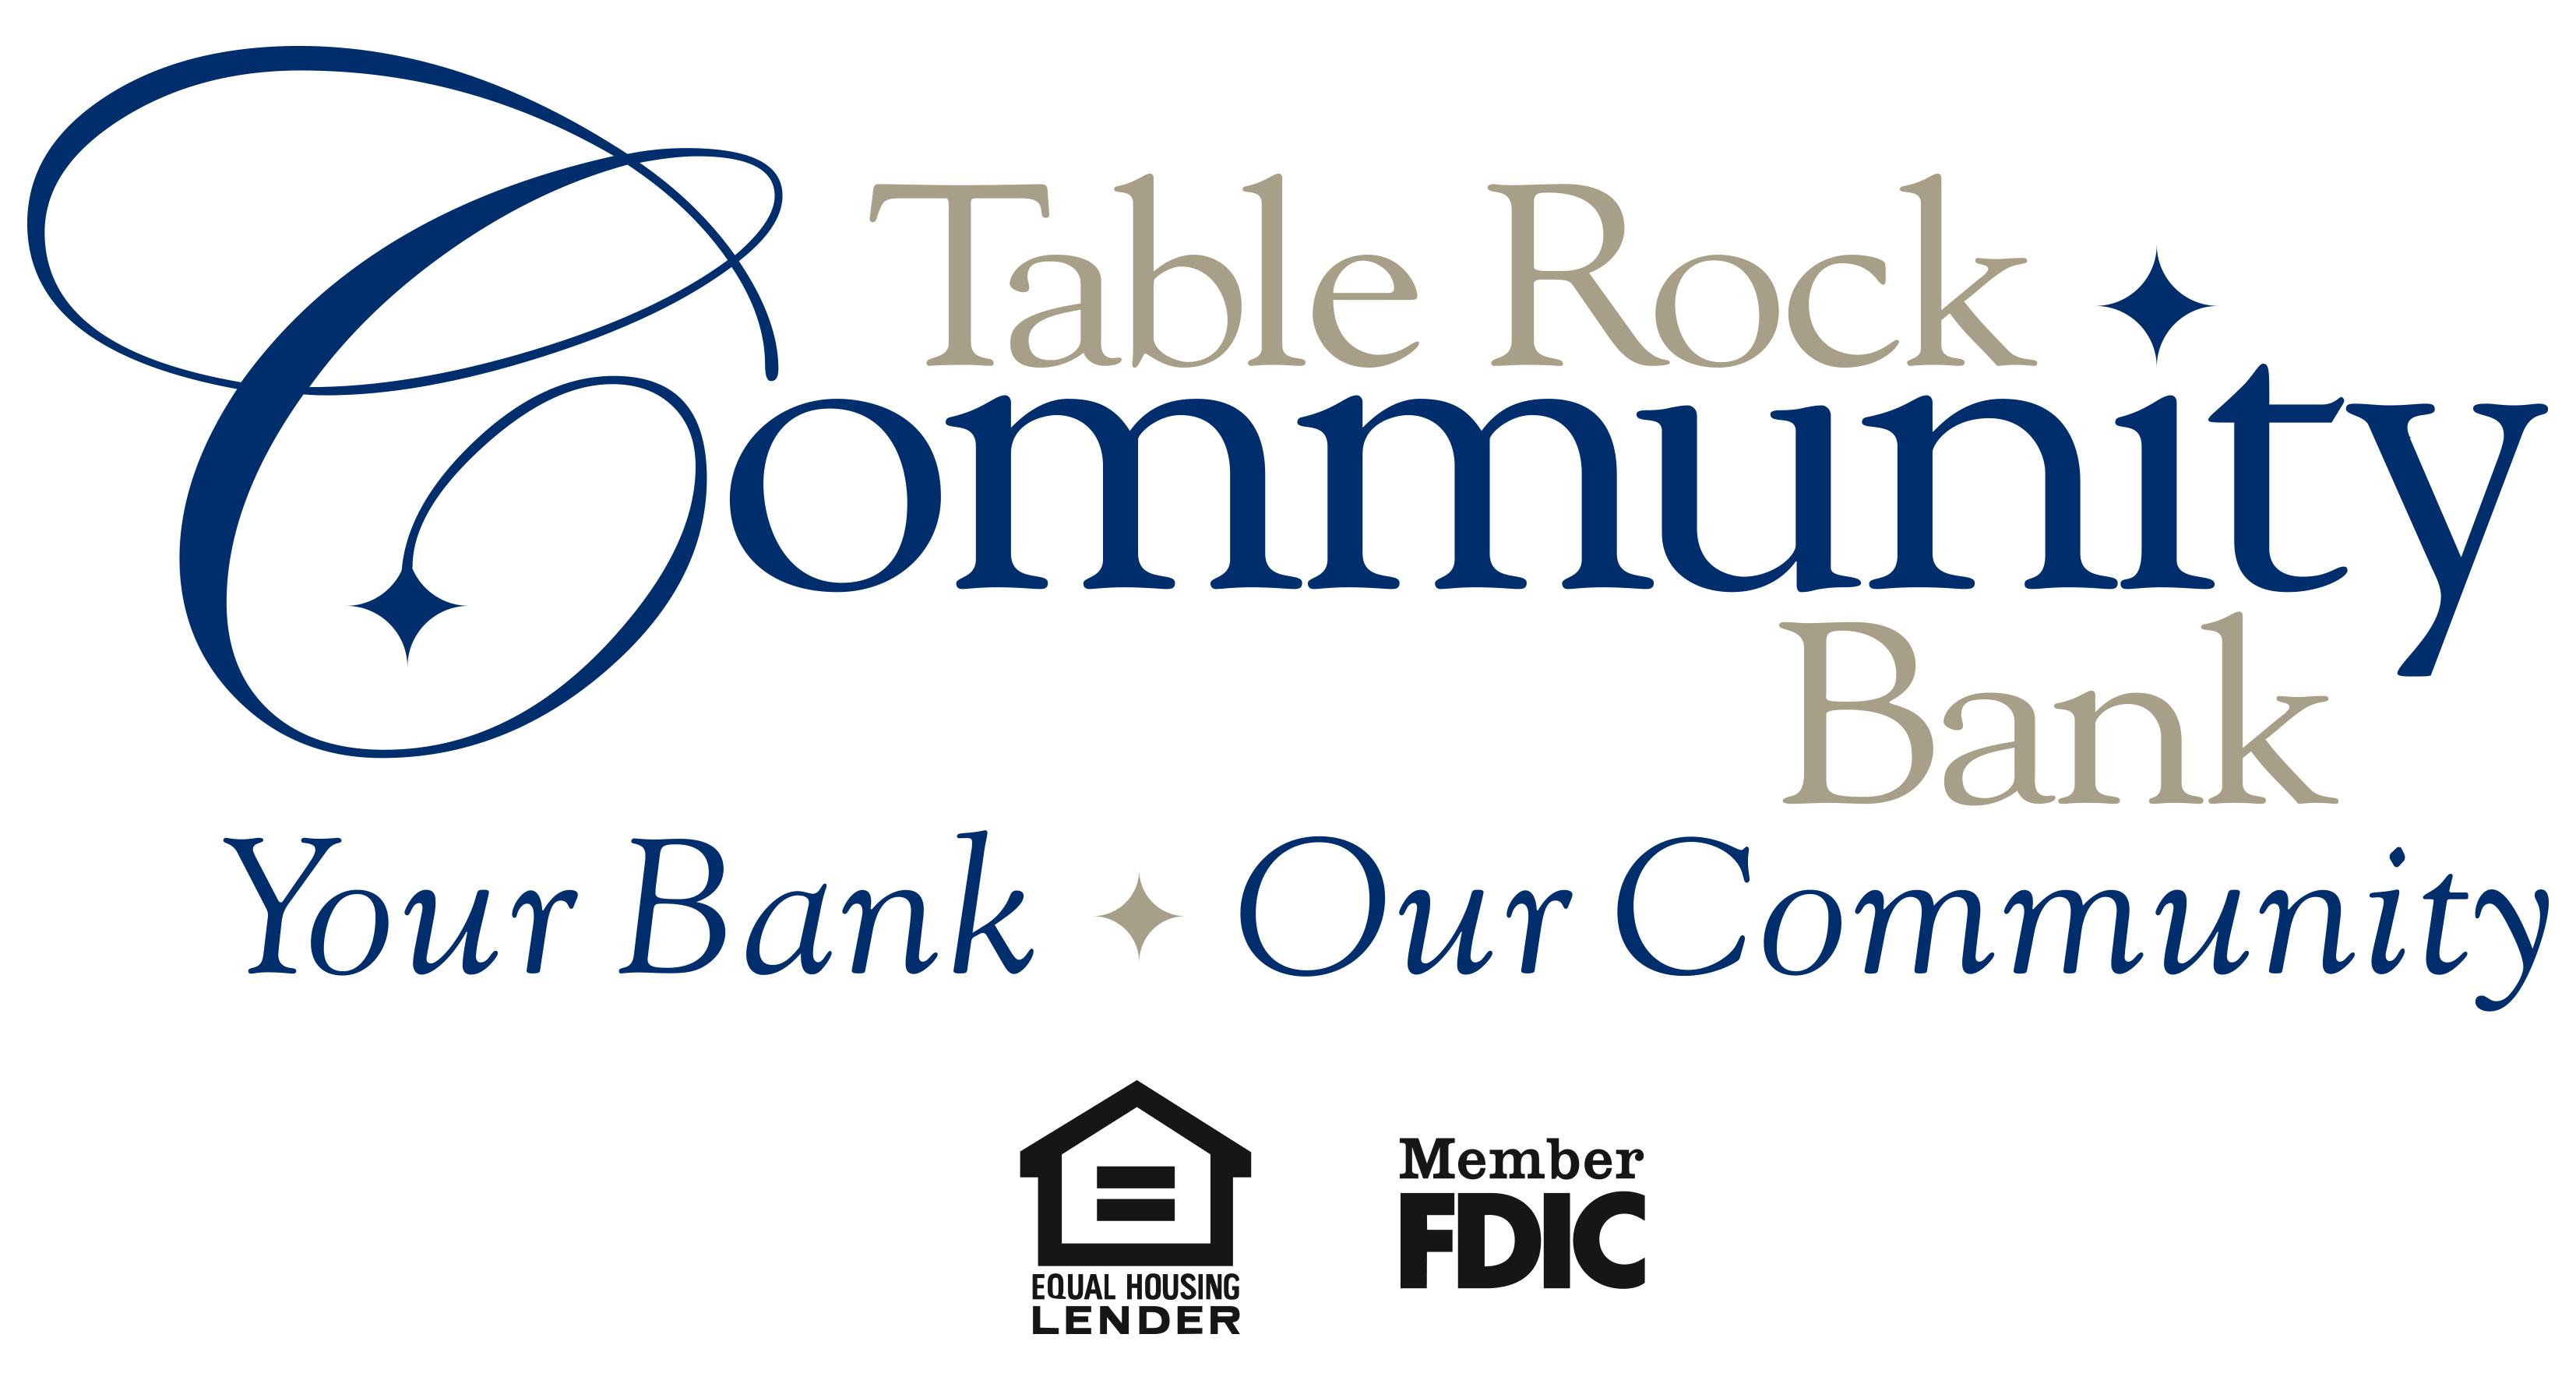 https://growthzonesitesprod.azureedge.net/wp-content/uploads/sites/969/2021/04/Table-Rock-Community-Bank-2021.jpg